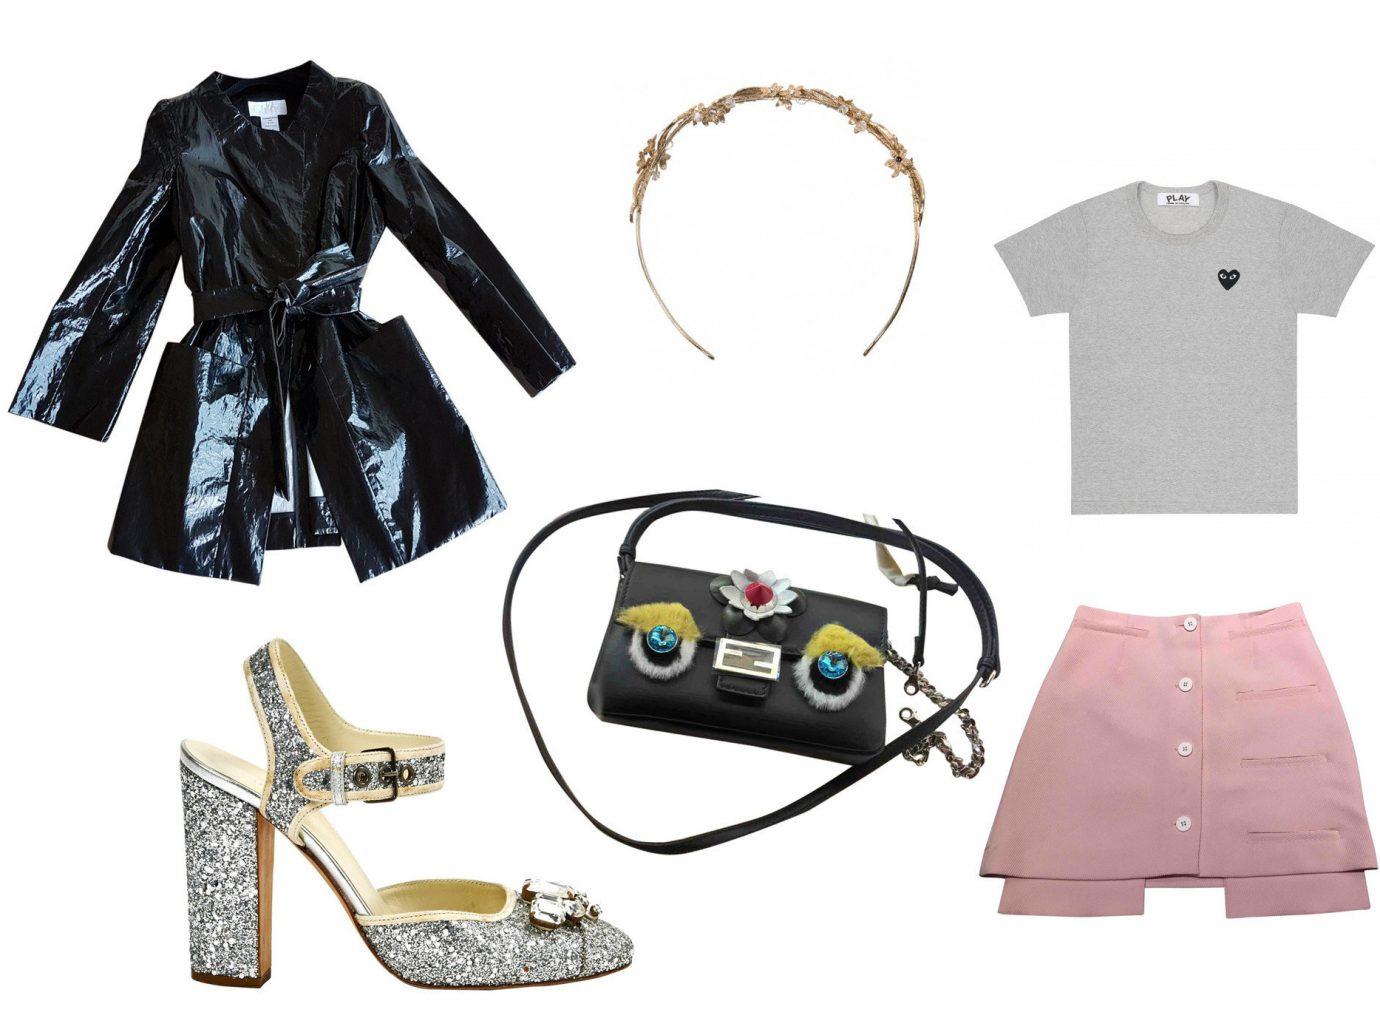 Trip Ideas clothing sleeve product footwear bag fashion outerwear brand pattern t shirt